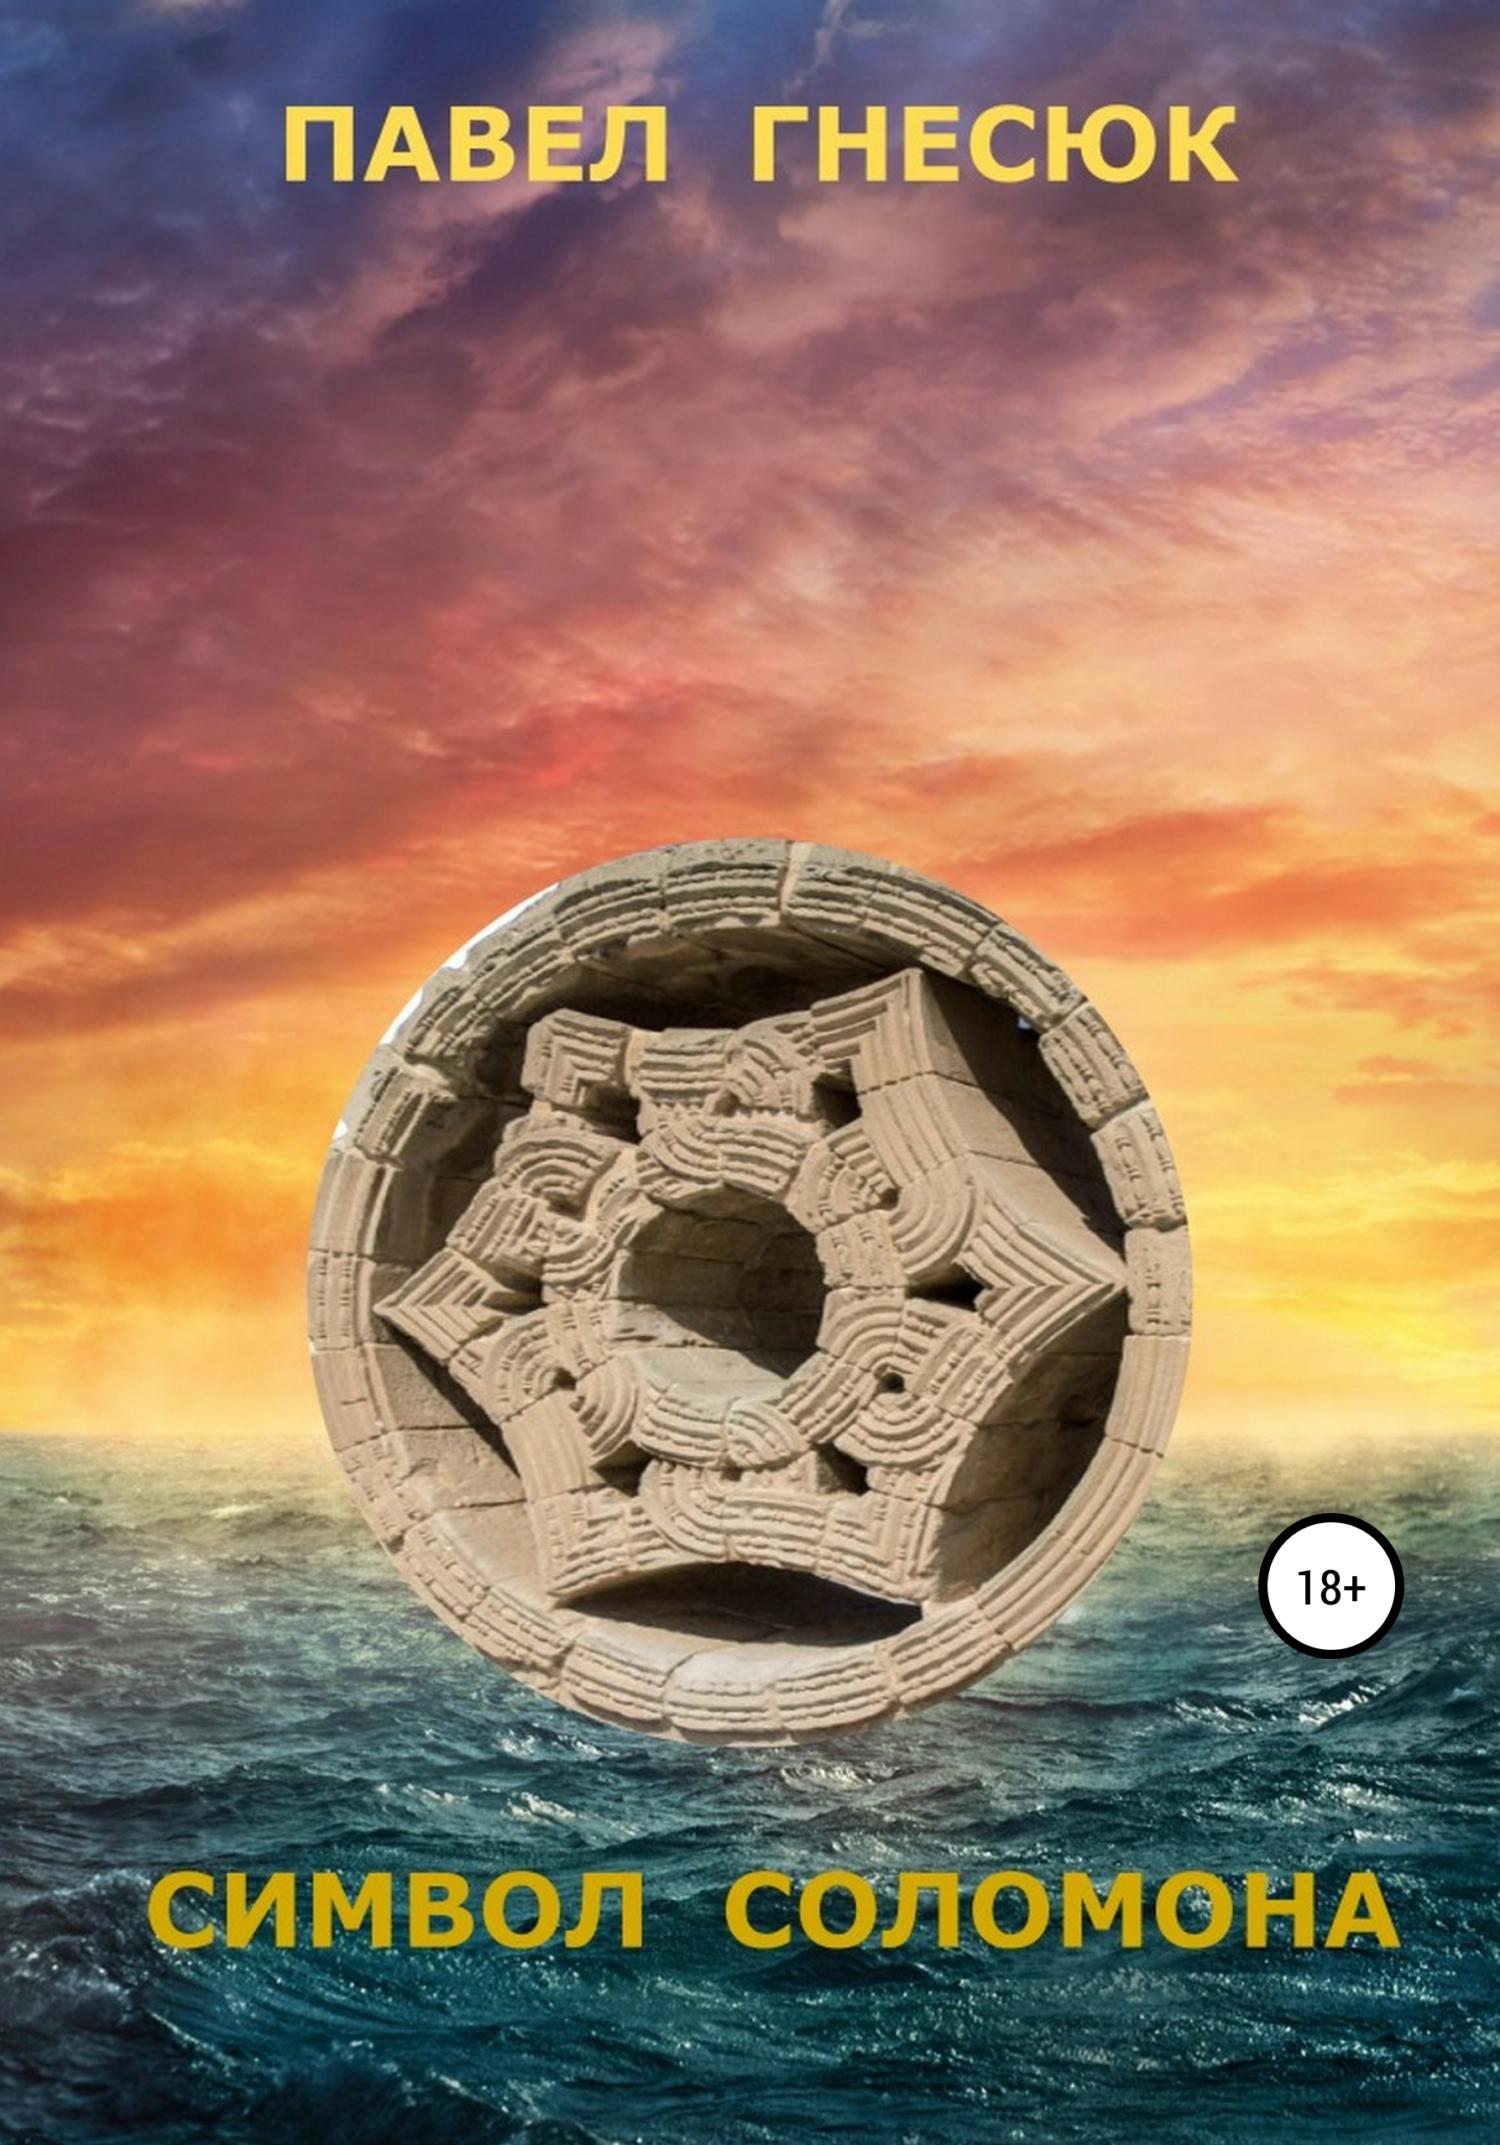 Символ Соломона